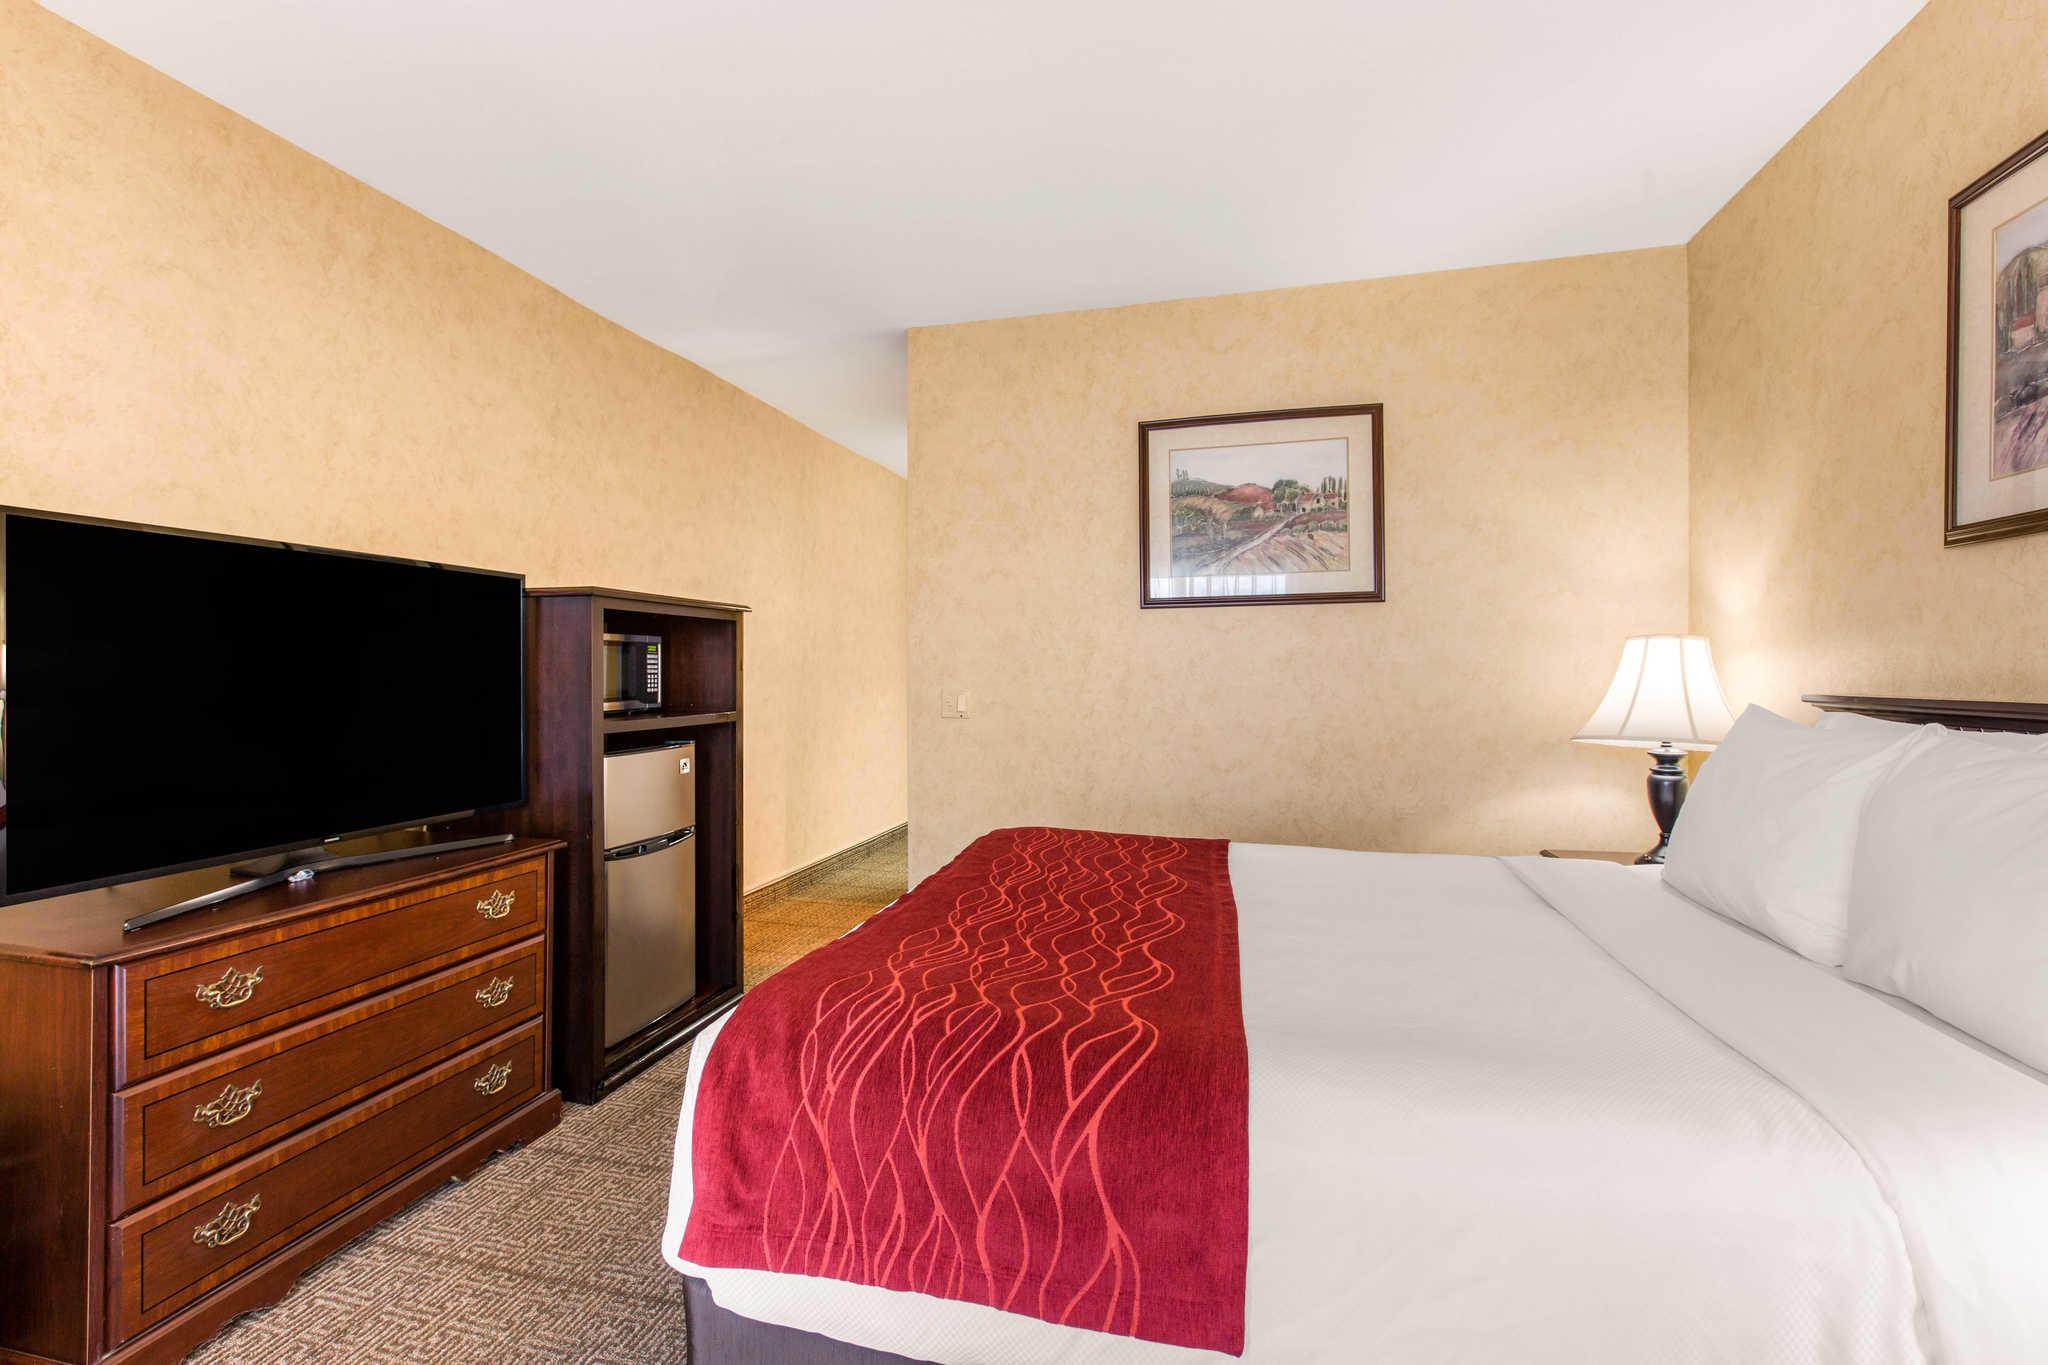 Comfort Inn Escondido San Diego North County image 23